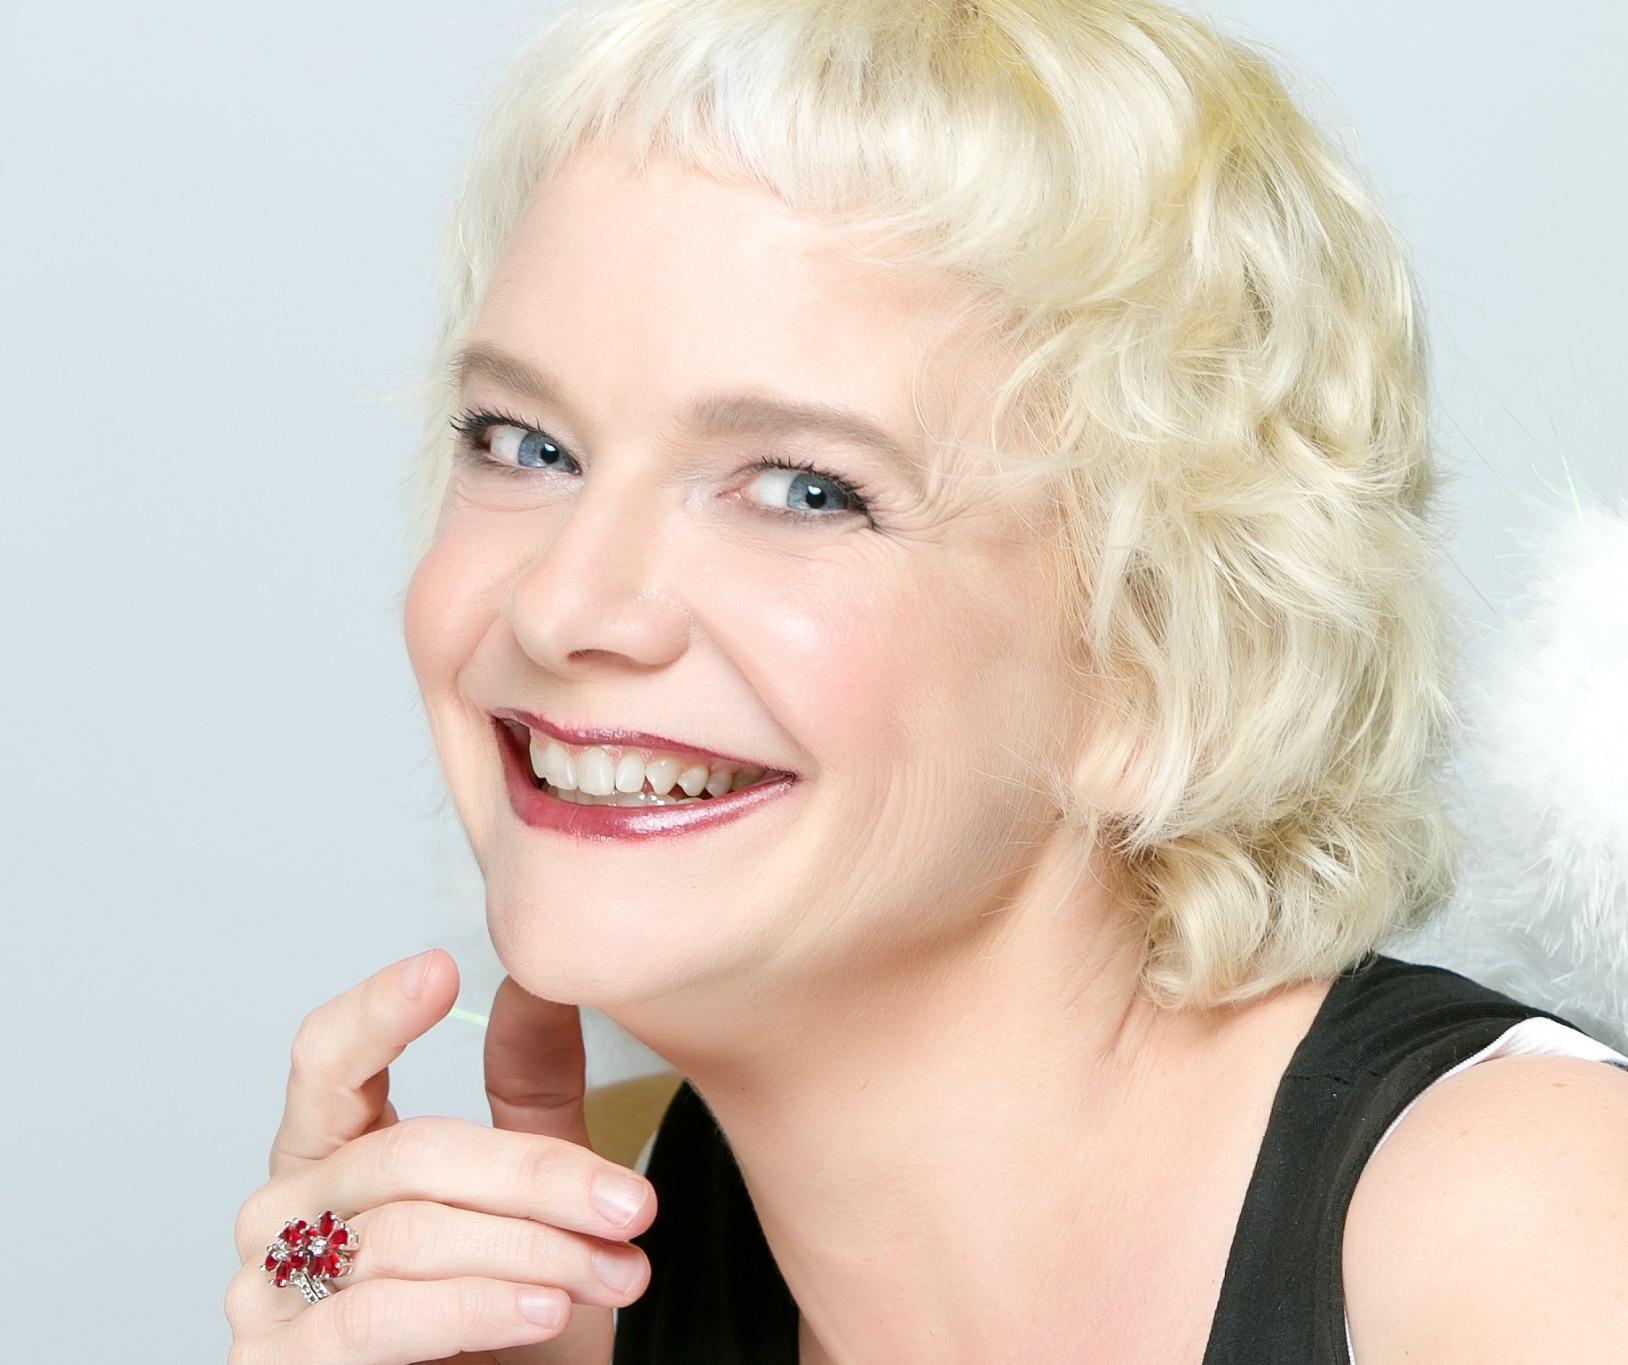 Shannon Walbran best online course Evolve dating gurus dating detox